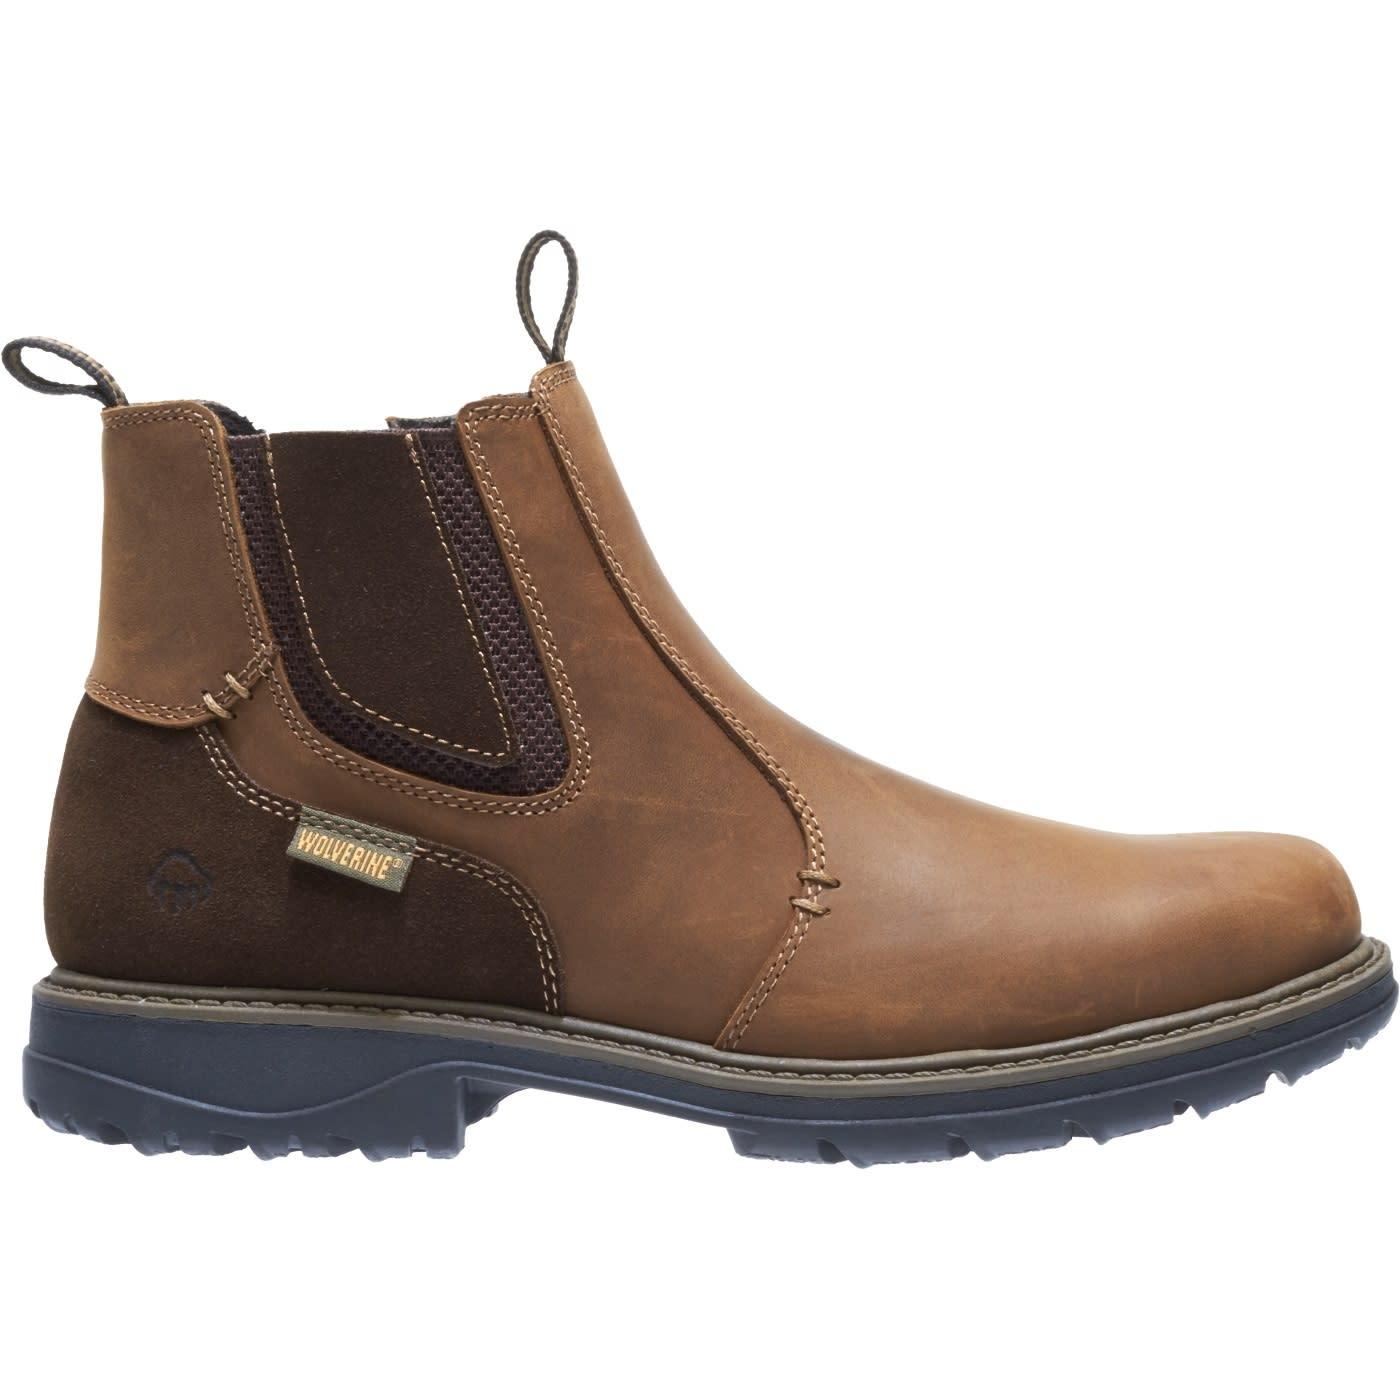 Wolverine Men's Georgian Mid Boots